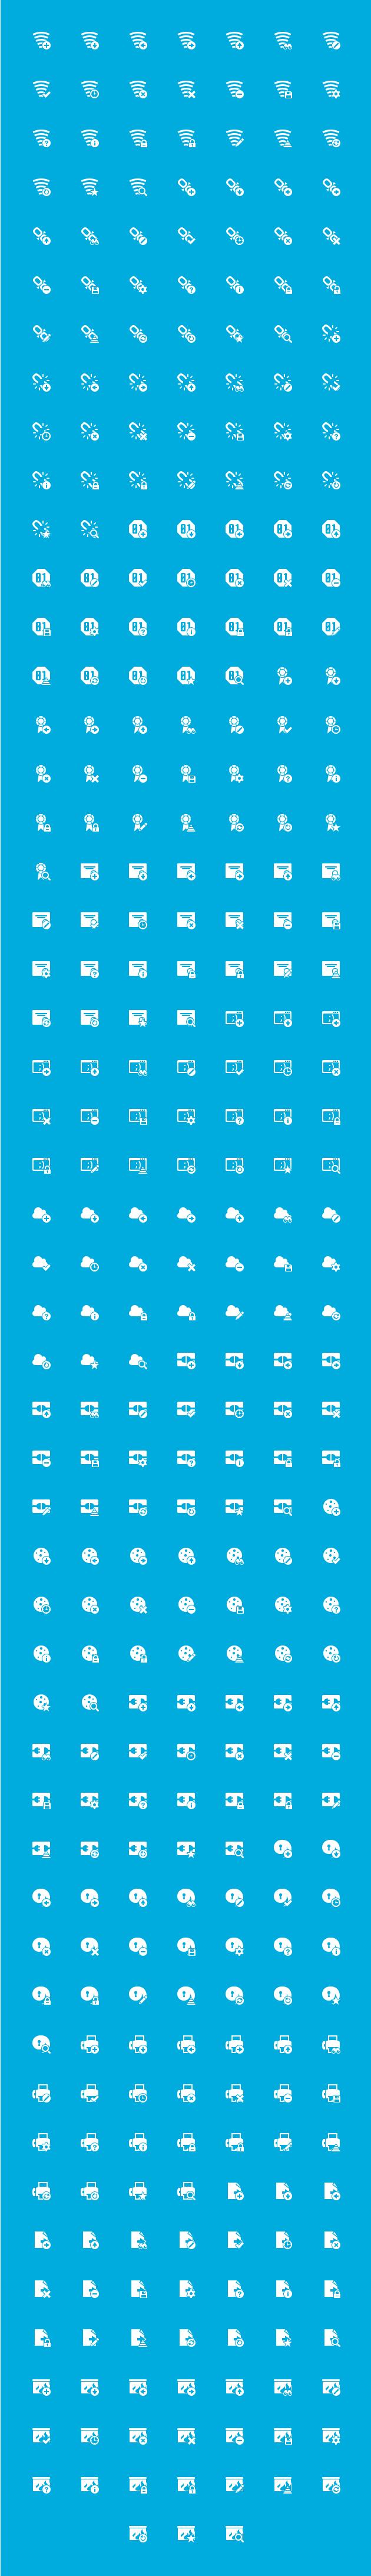 windows 8 networking addons